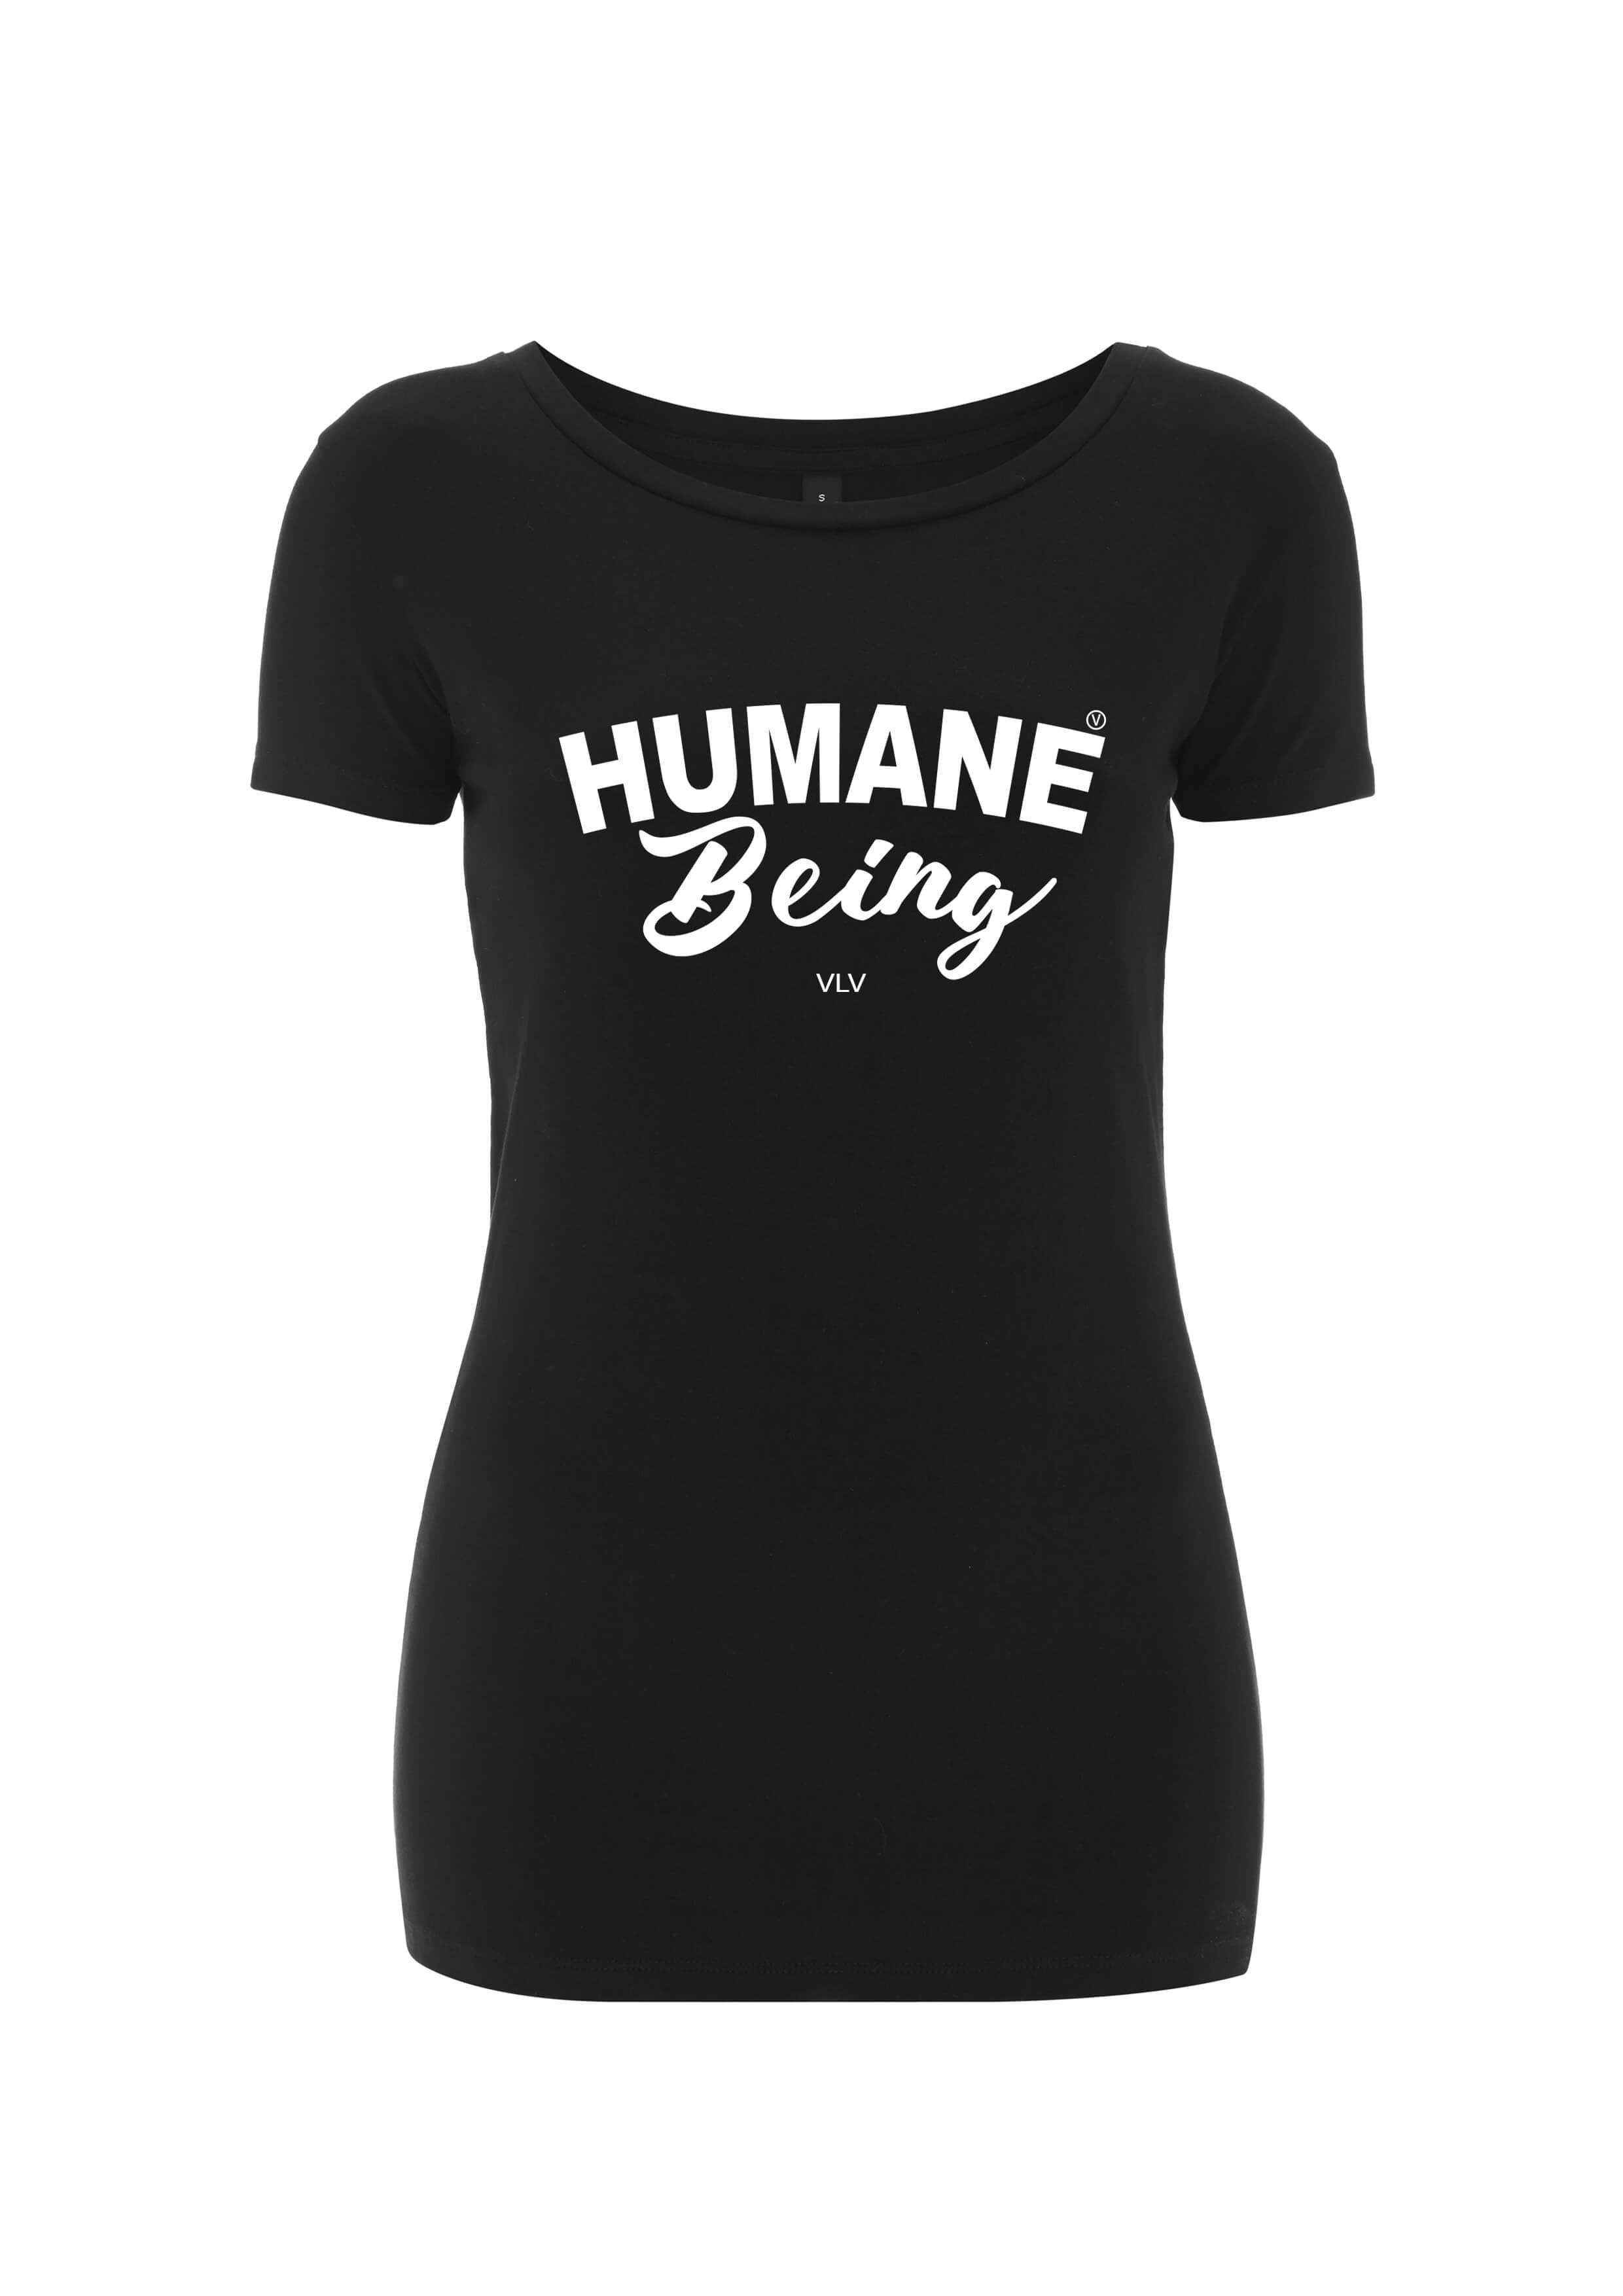 Women's Tshirt : Humane Being